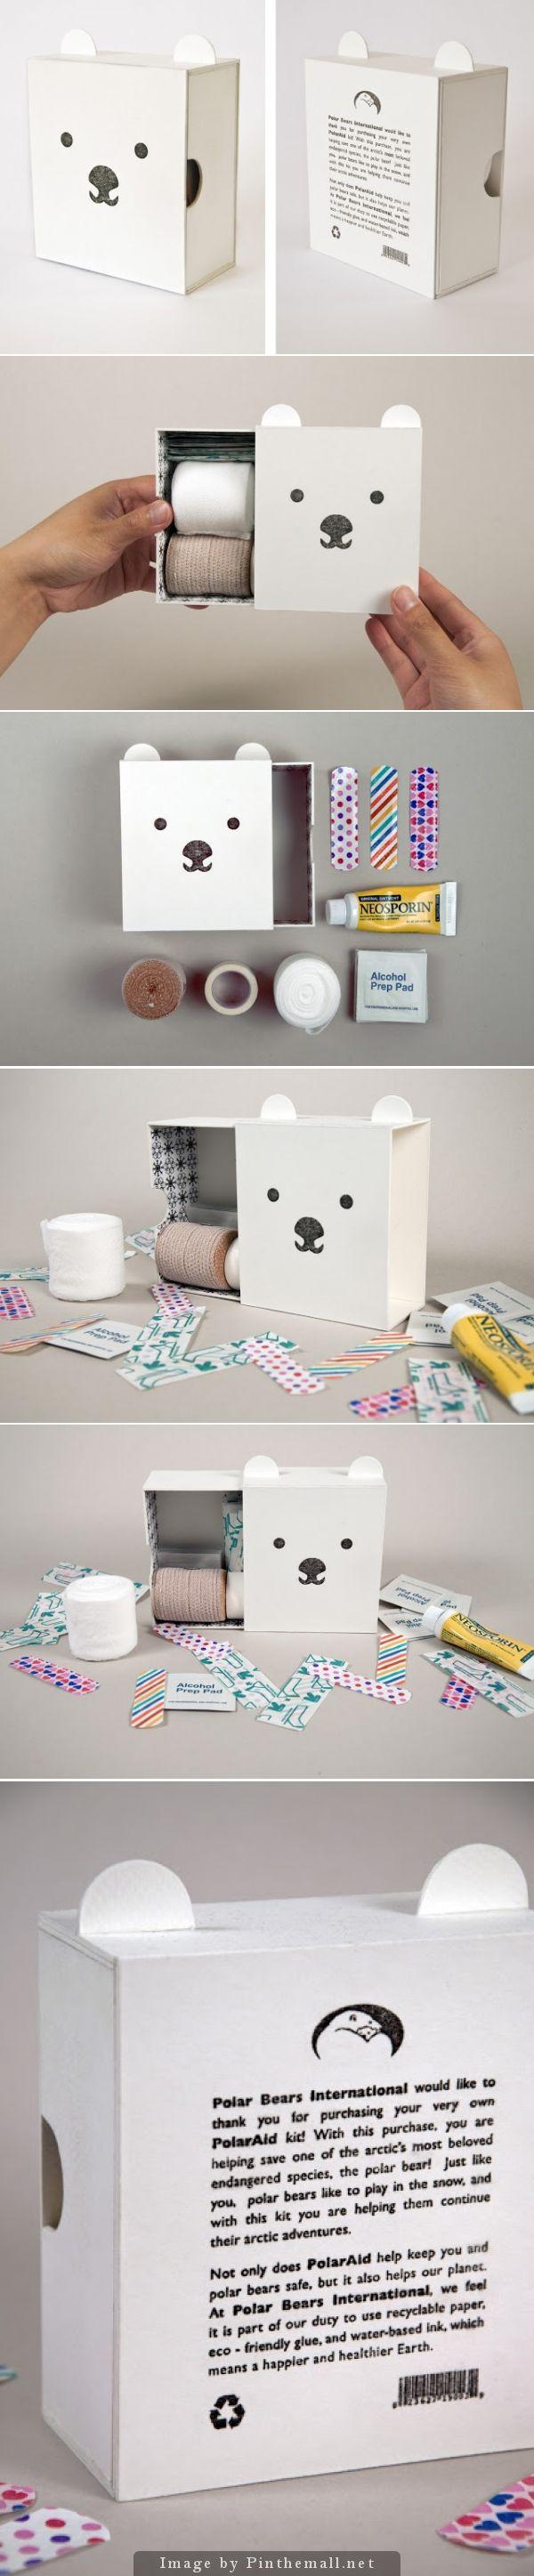 PolarAid Kit (Student Project)